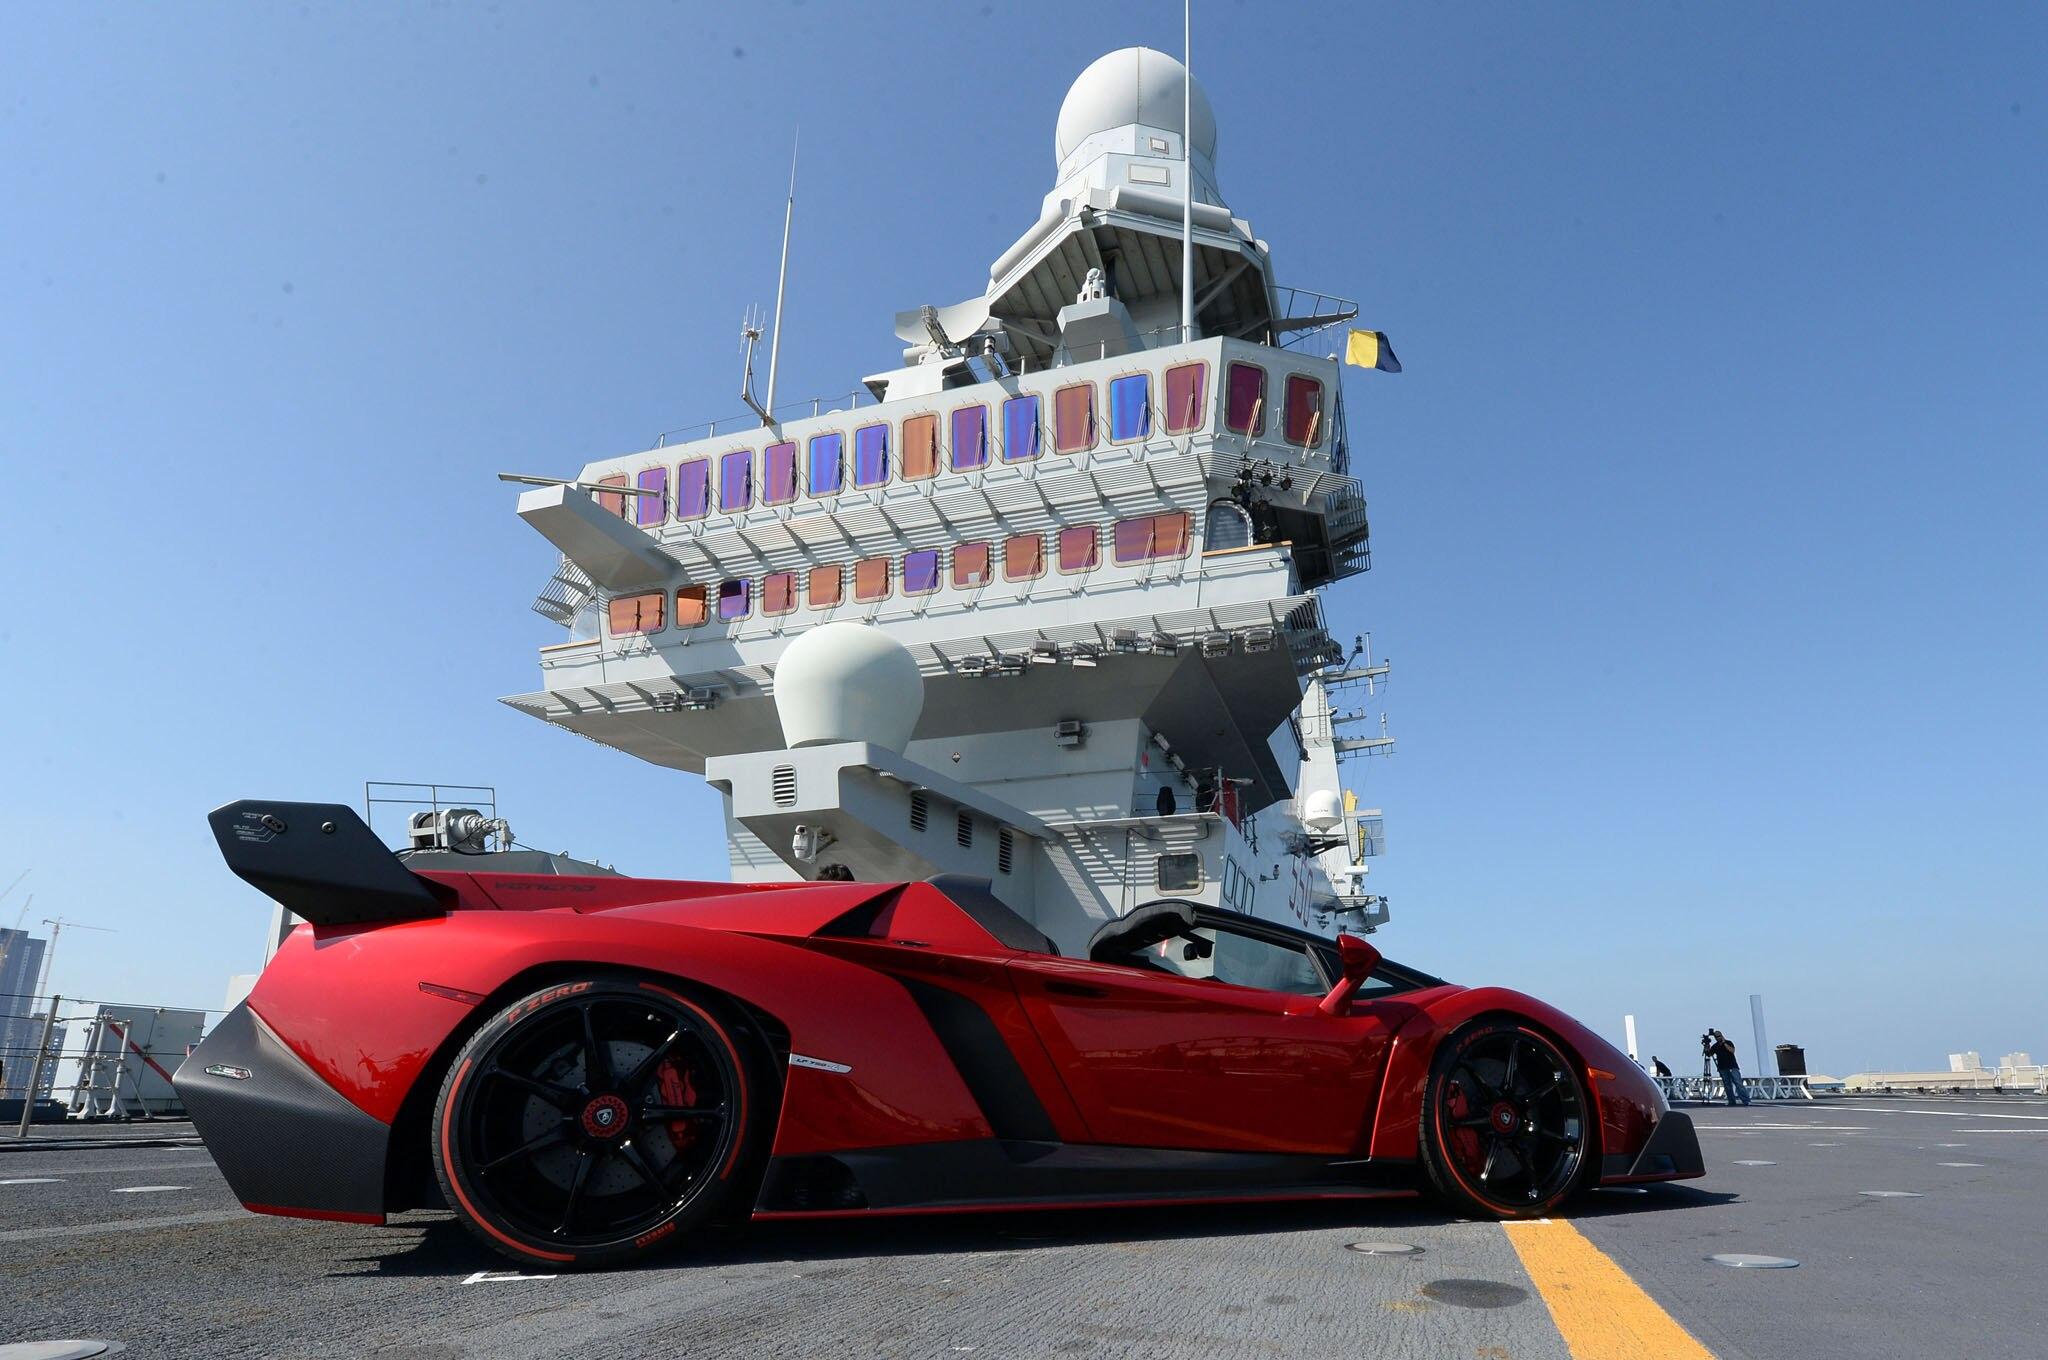 How Much Is Lamborghini Veneno Idee D Image De Voiture